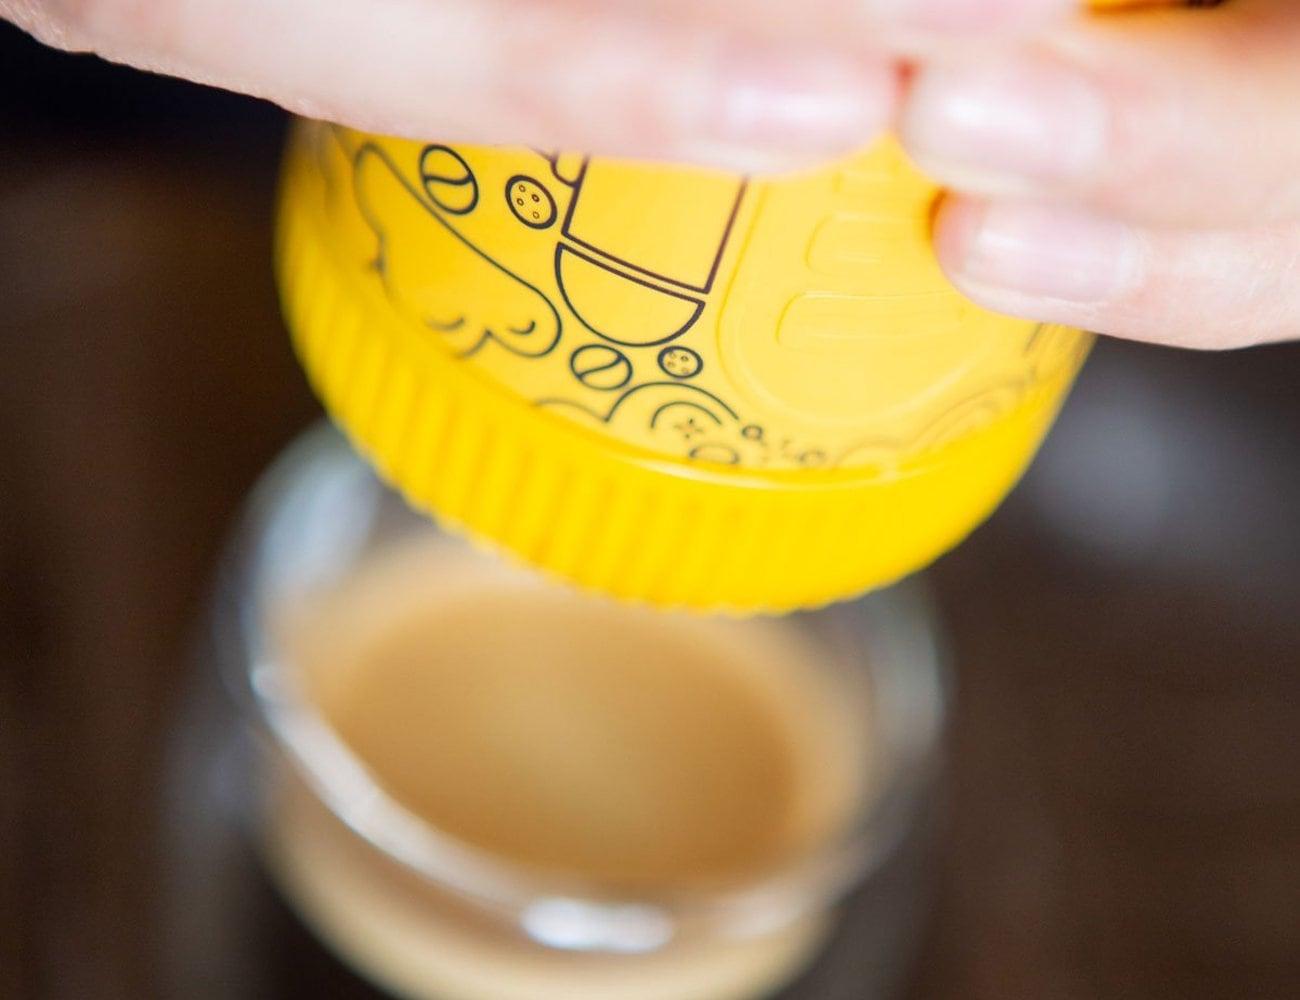 Nanopresso Yellow Tattoo Handheld Portable Espresso Machine gives up to 18 bars of pressure